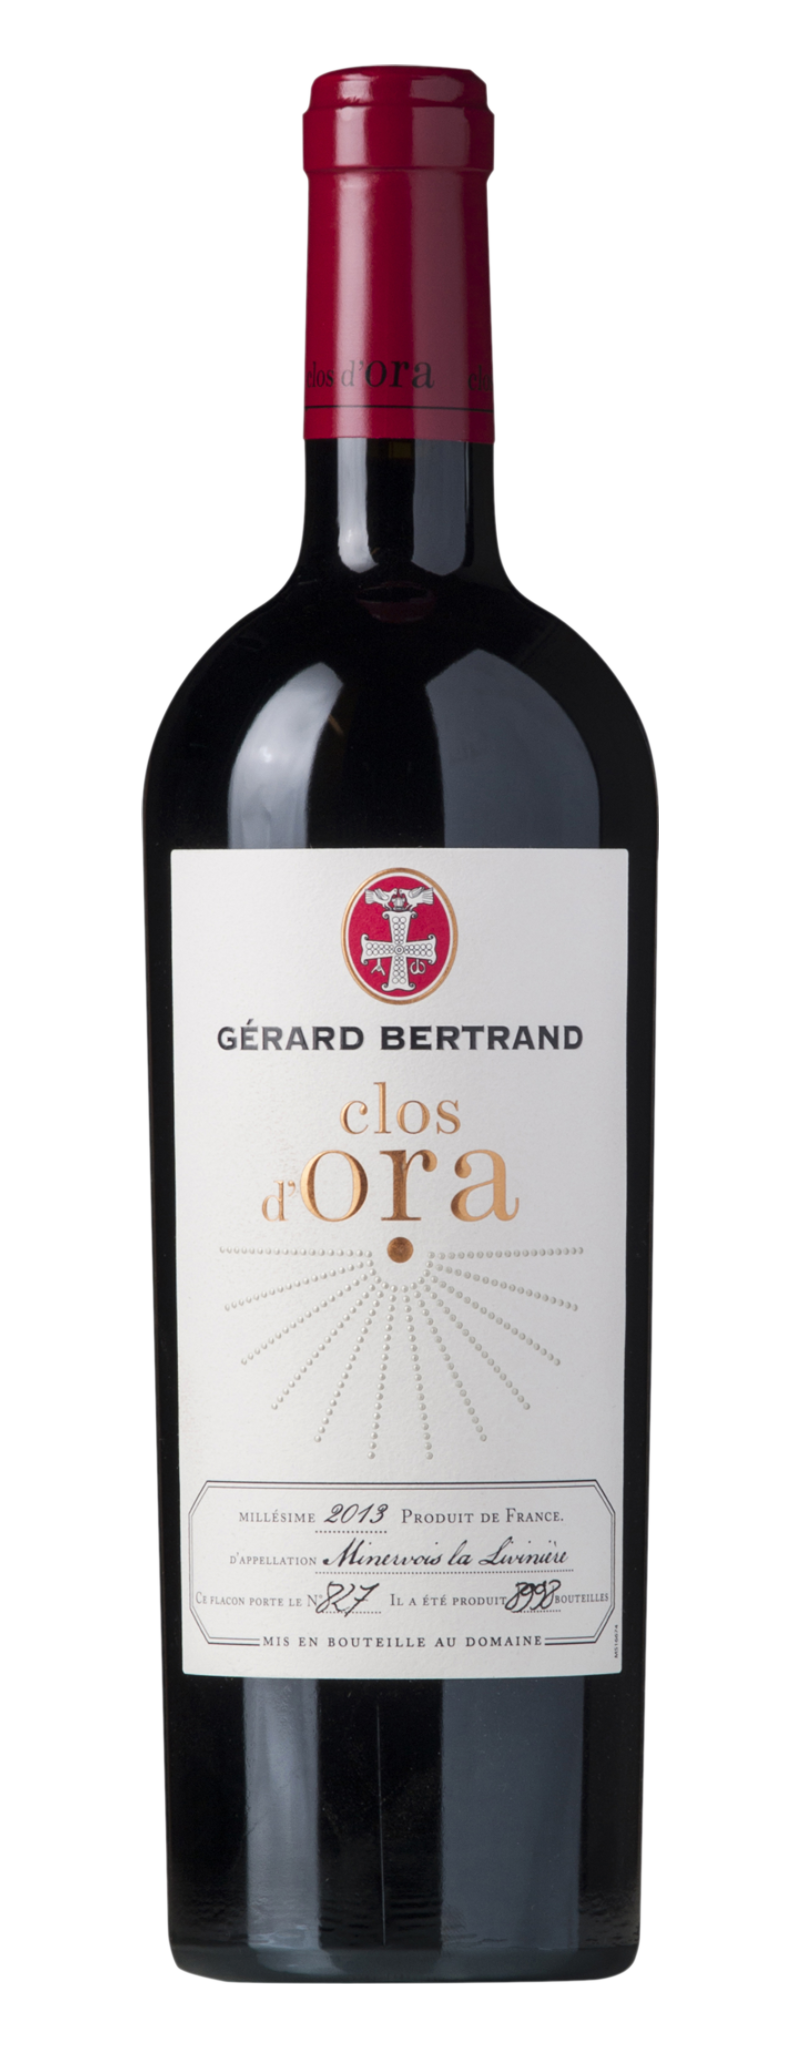 Gérard Bertrand - Clos d'Ora  - 750ml